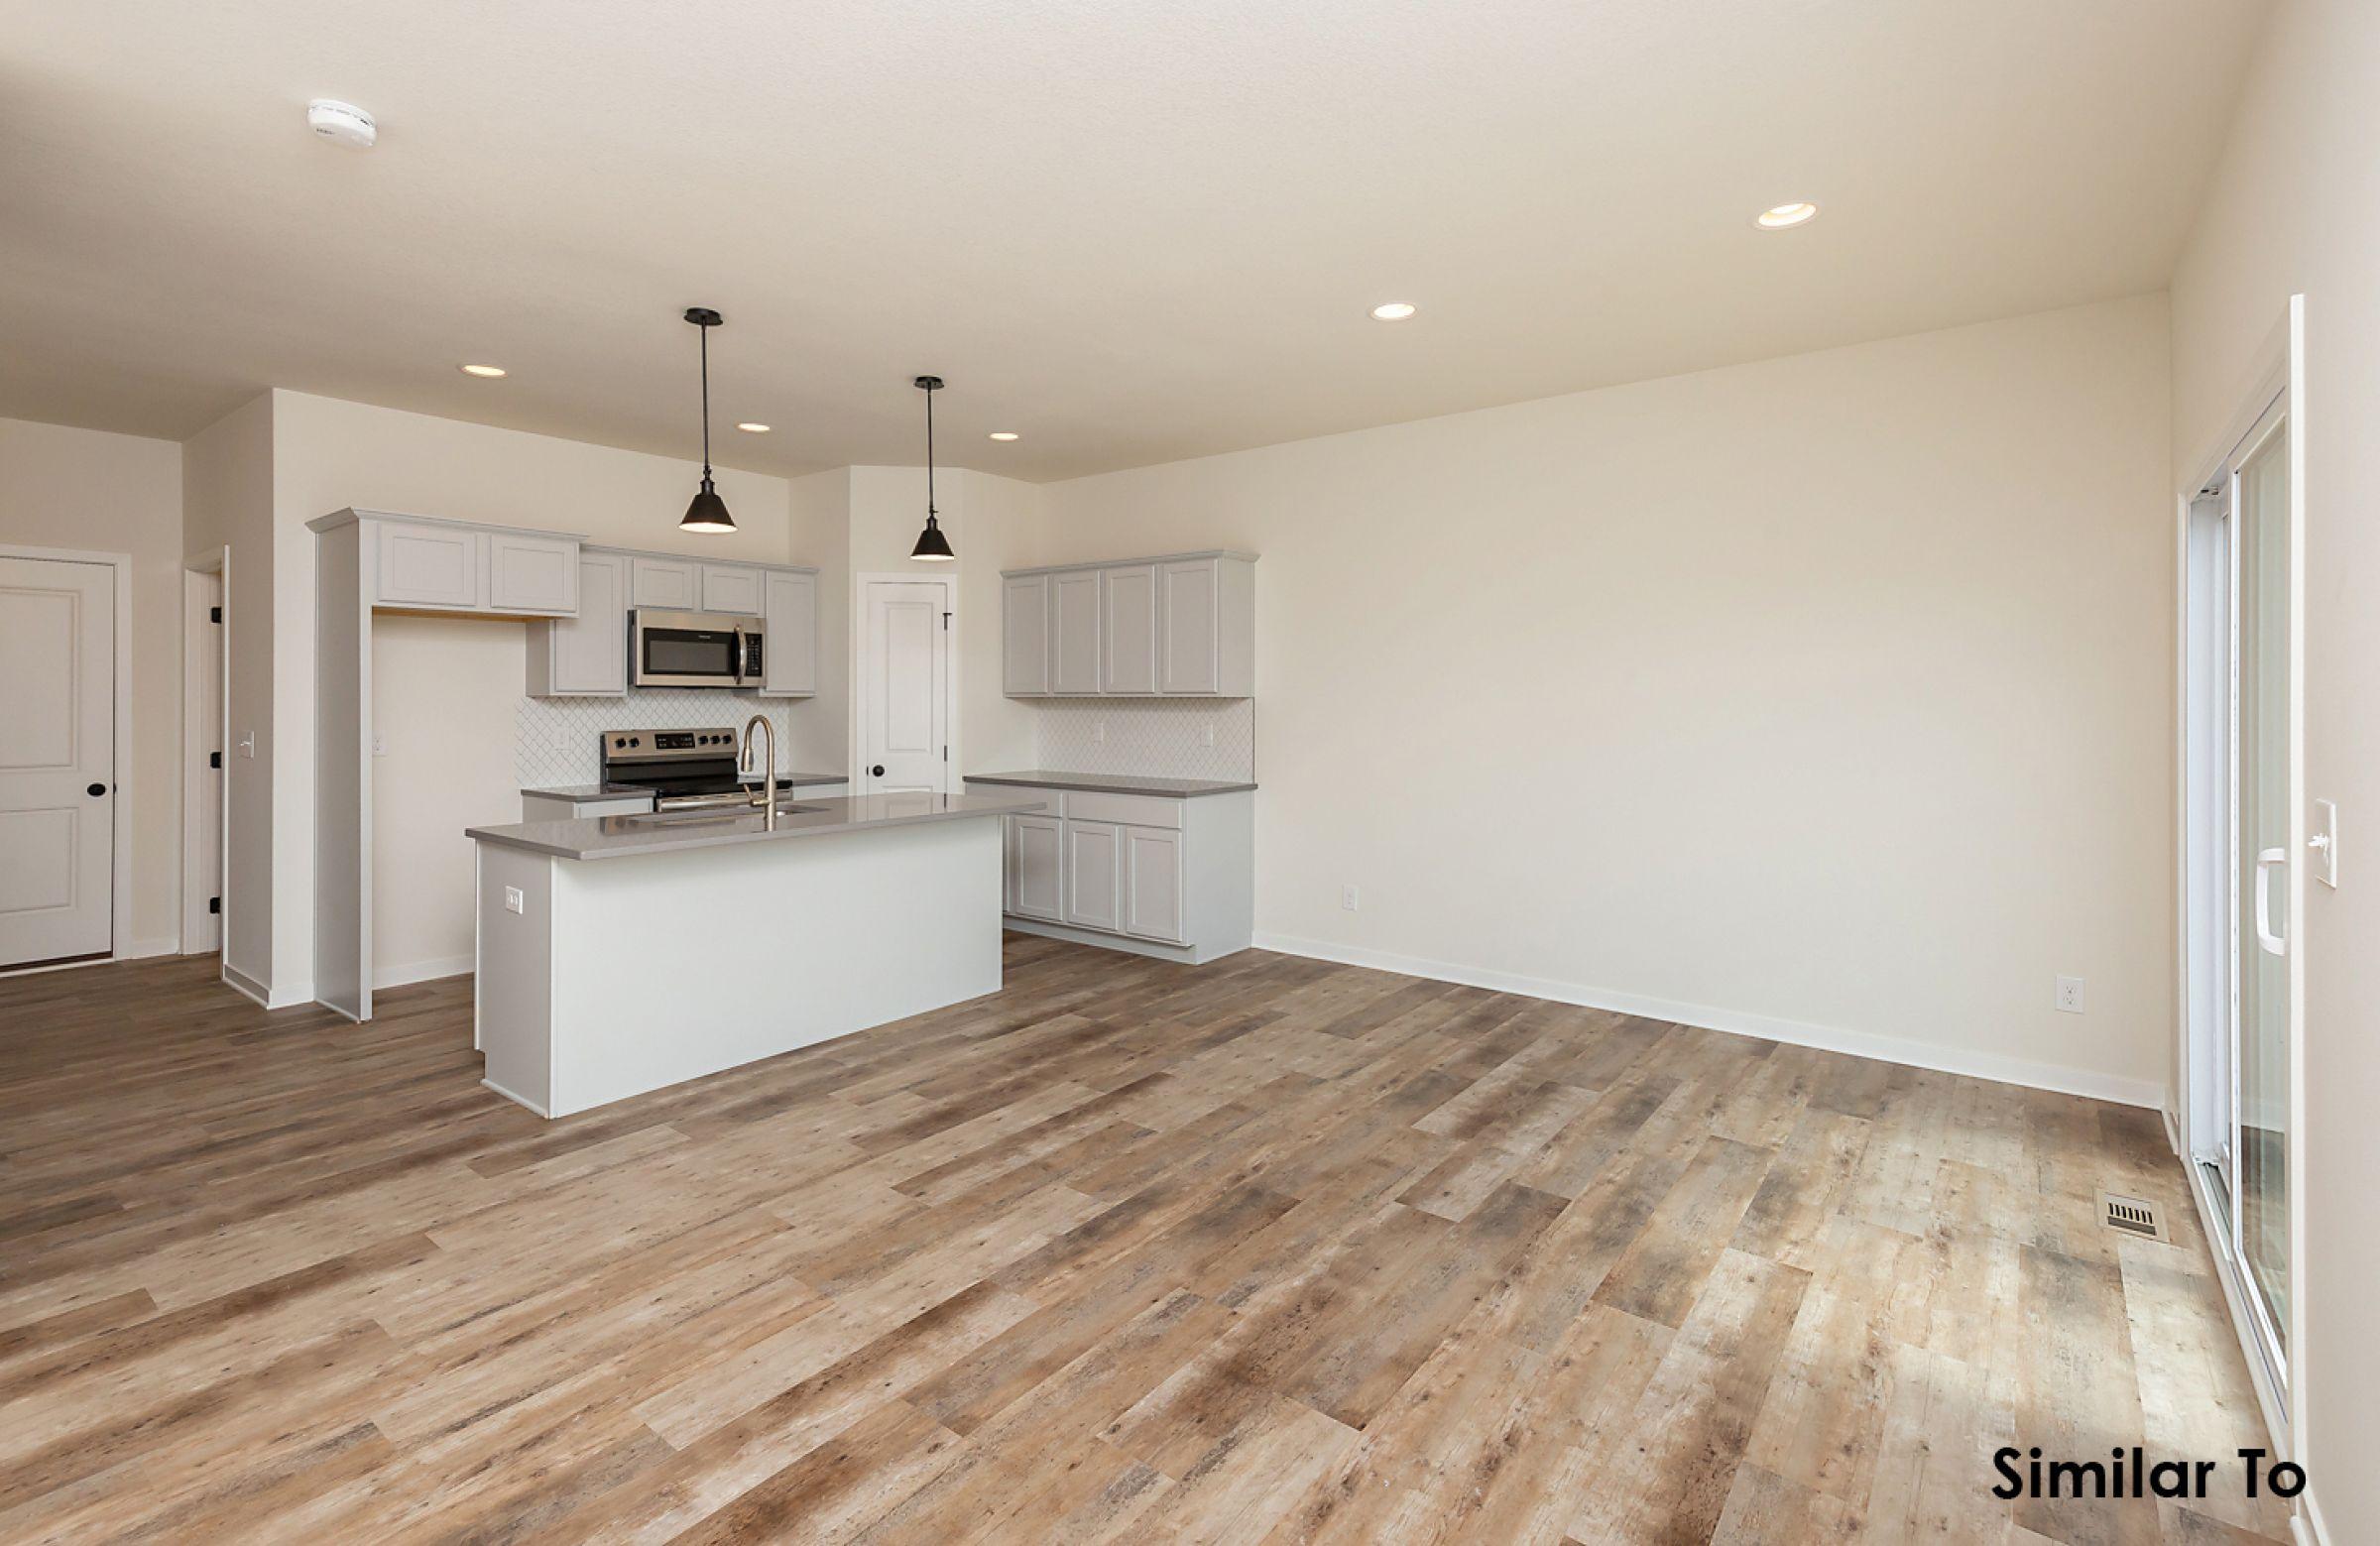 residential-warren-county-iowa-0-acres-listing-number-15134-9-2020-08-27-185028.jpg